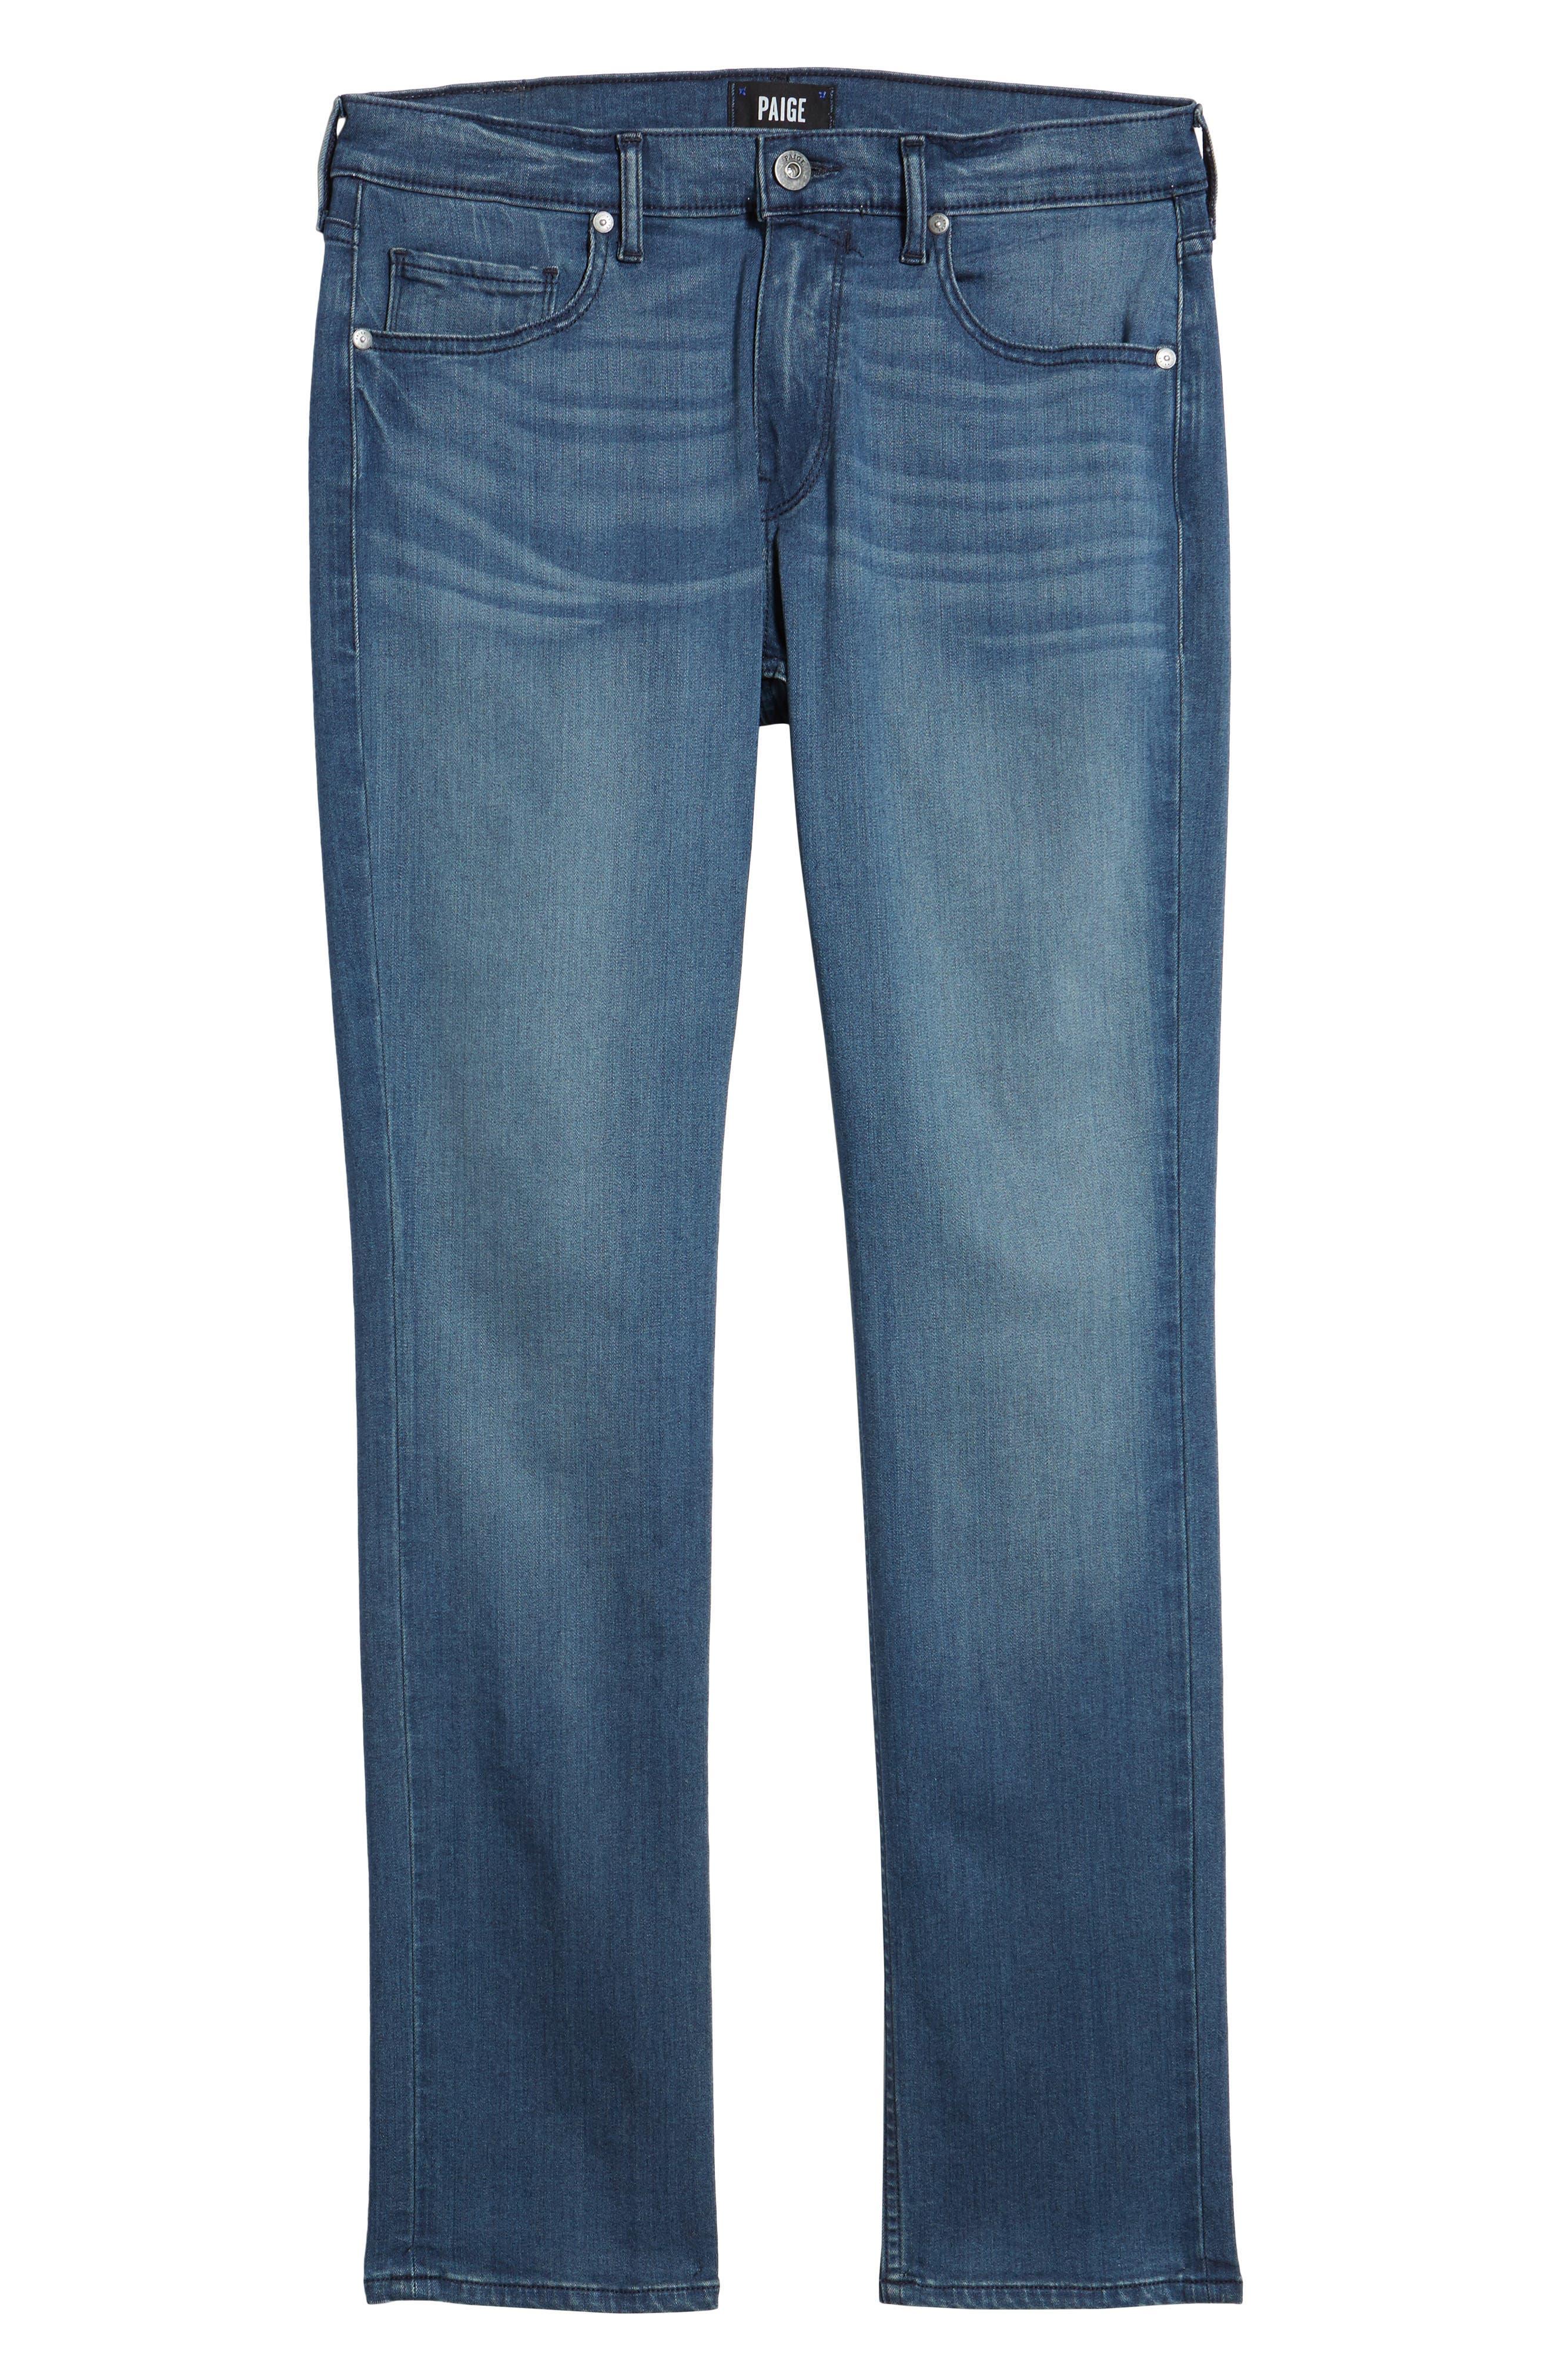 Transcend - Federal Slim Straight Fit Jeans,                             Alternate thumbnail 6, color,                             400